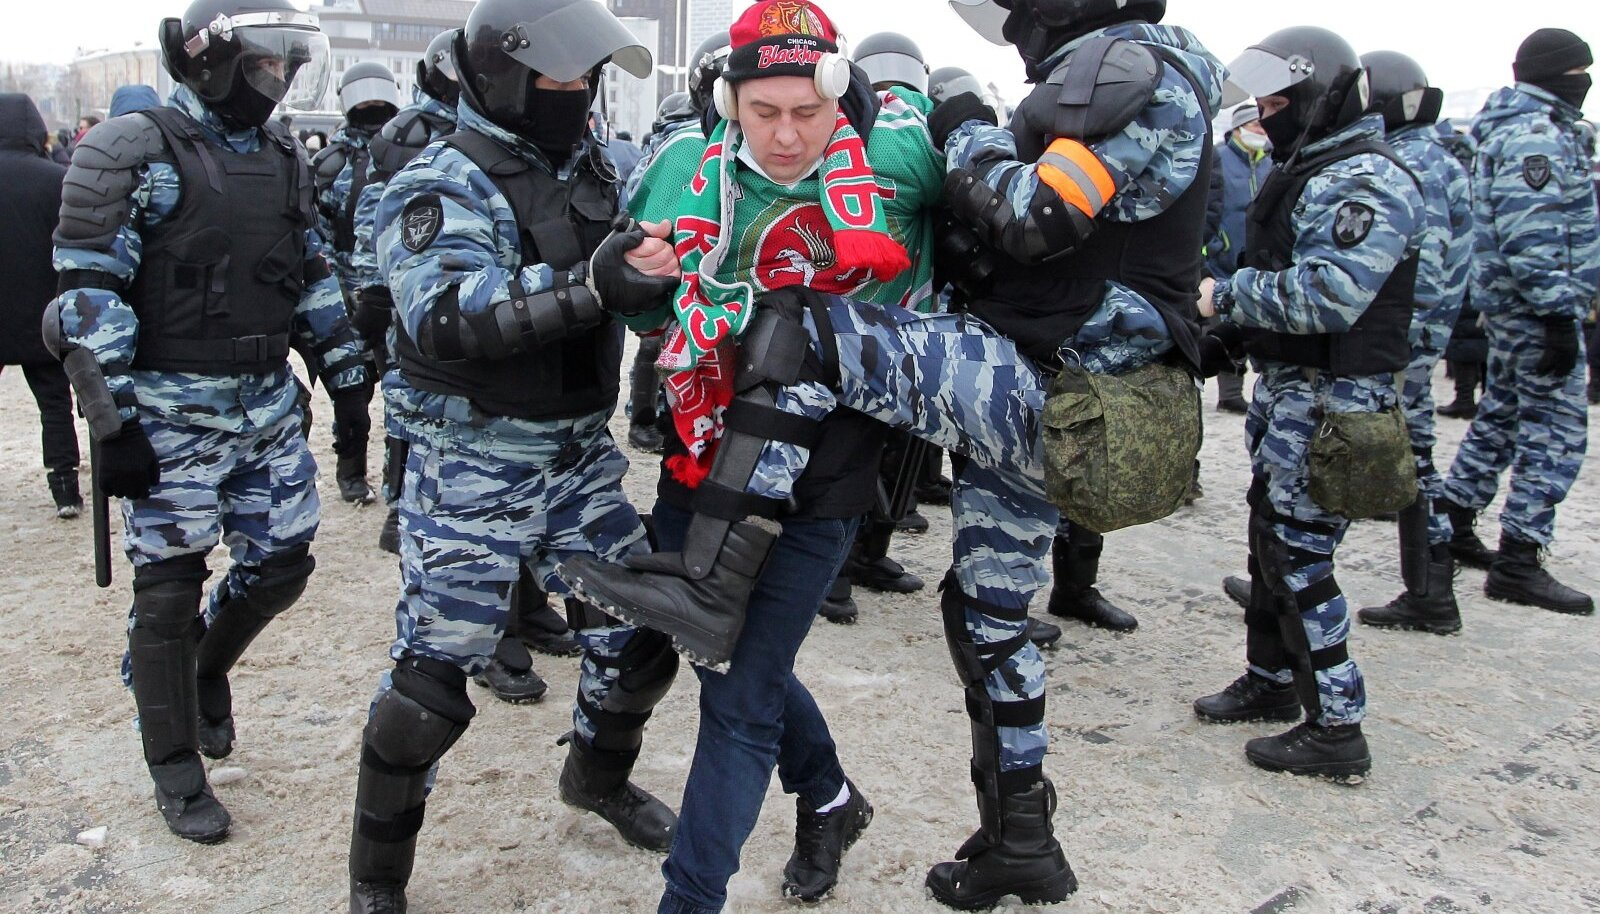 Rally in support of Alexei Navalny in Kazan